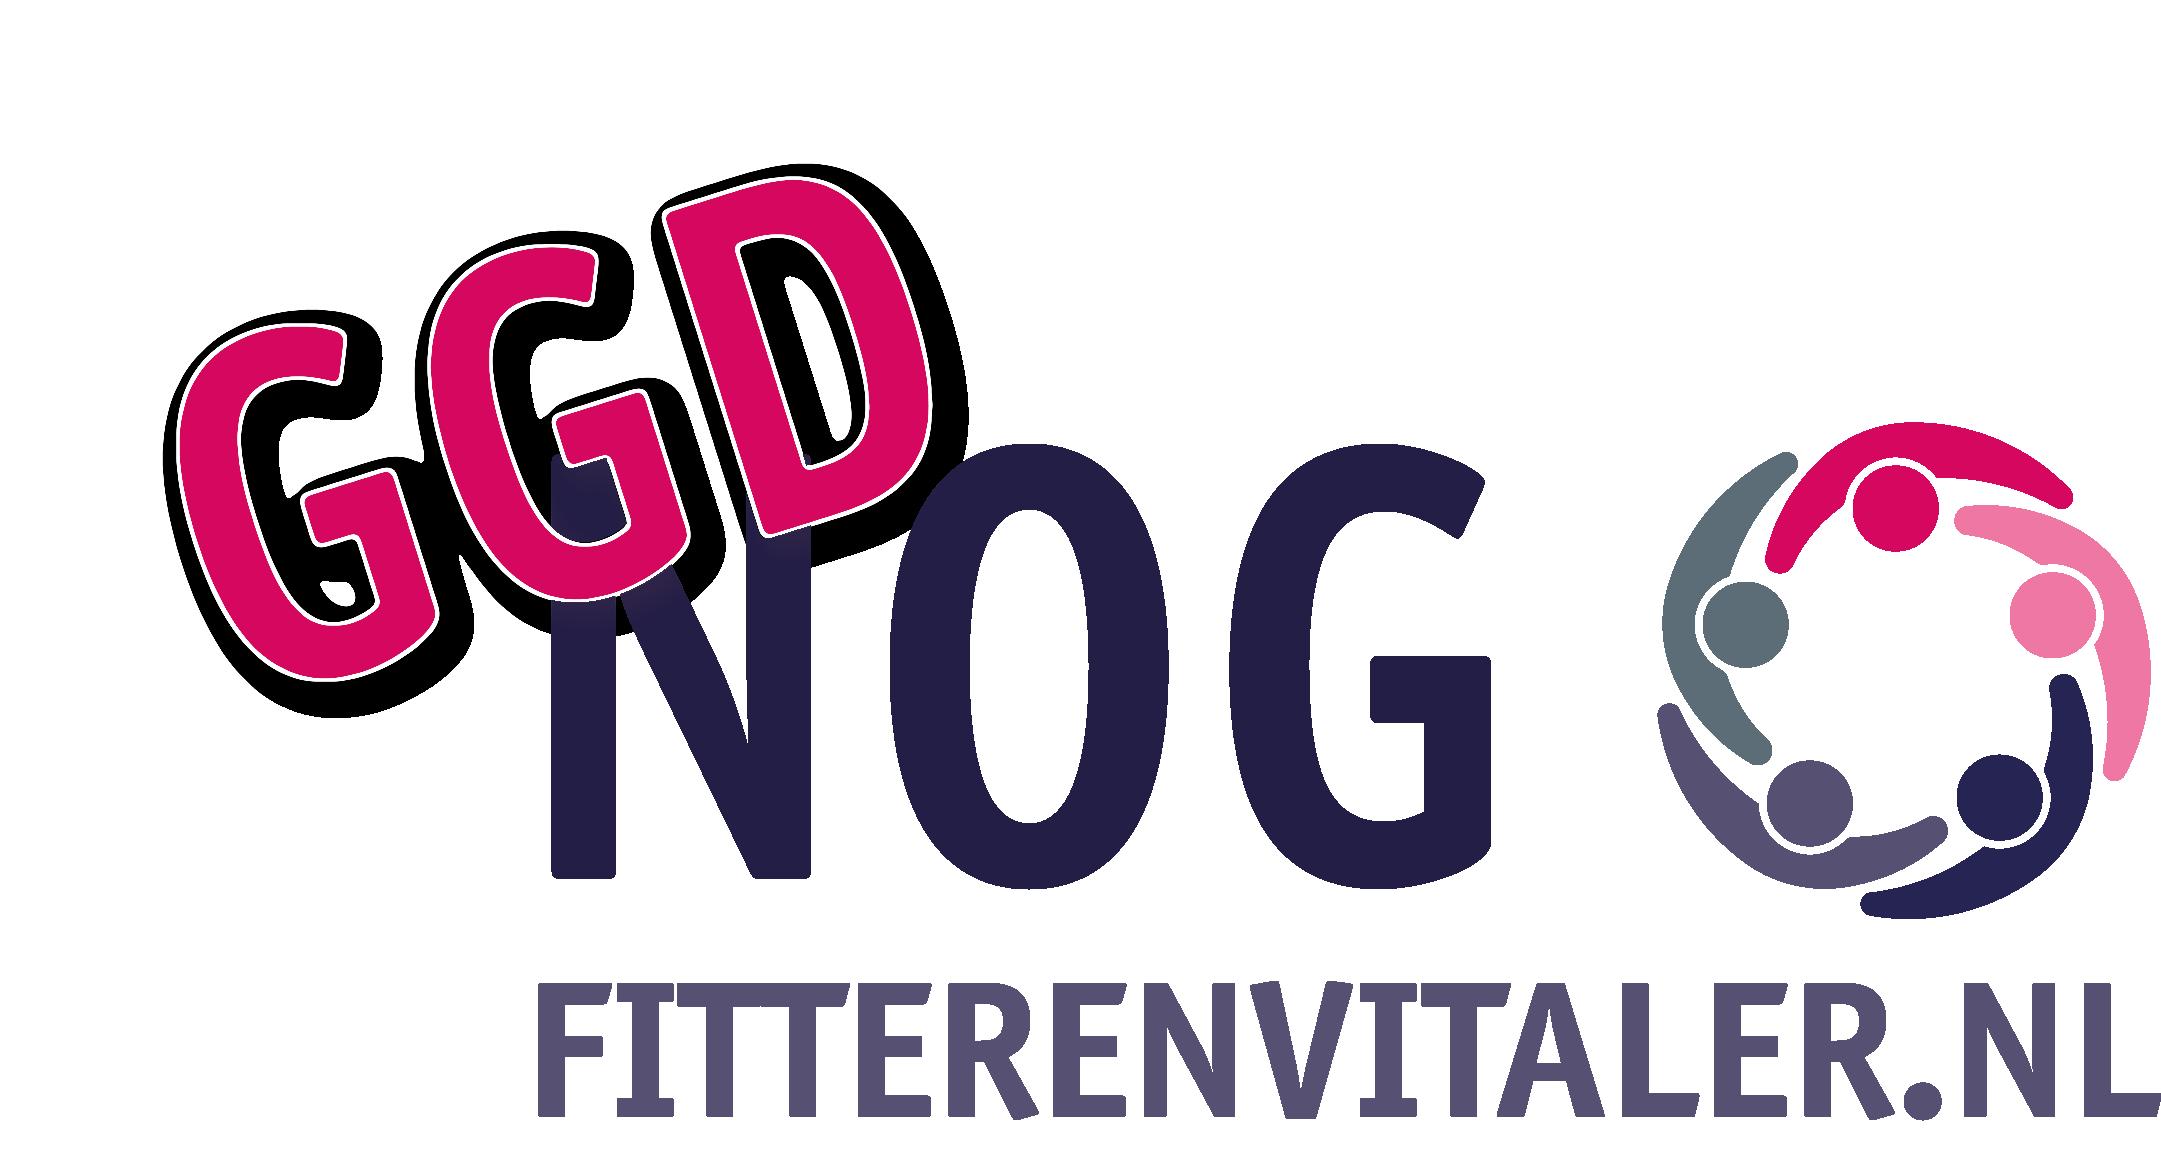 LogoINTERN-GGD-NOG FitterEnVitaler